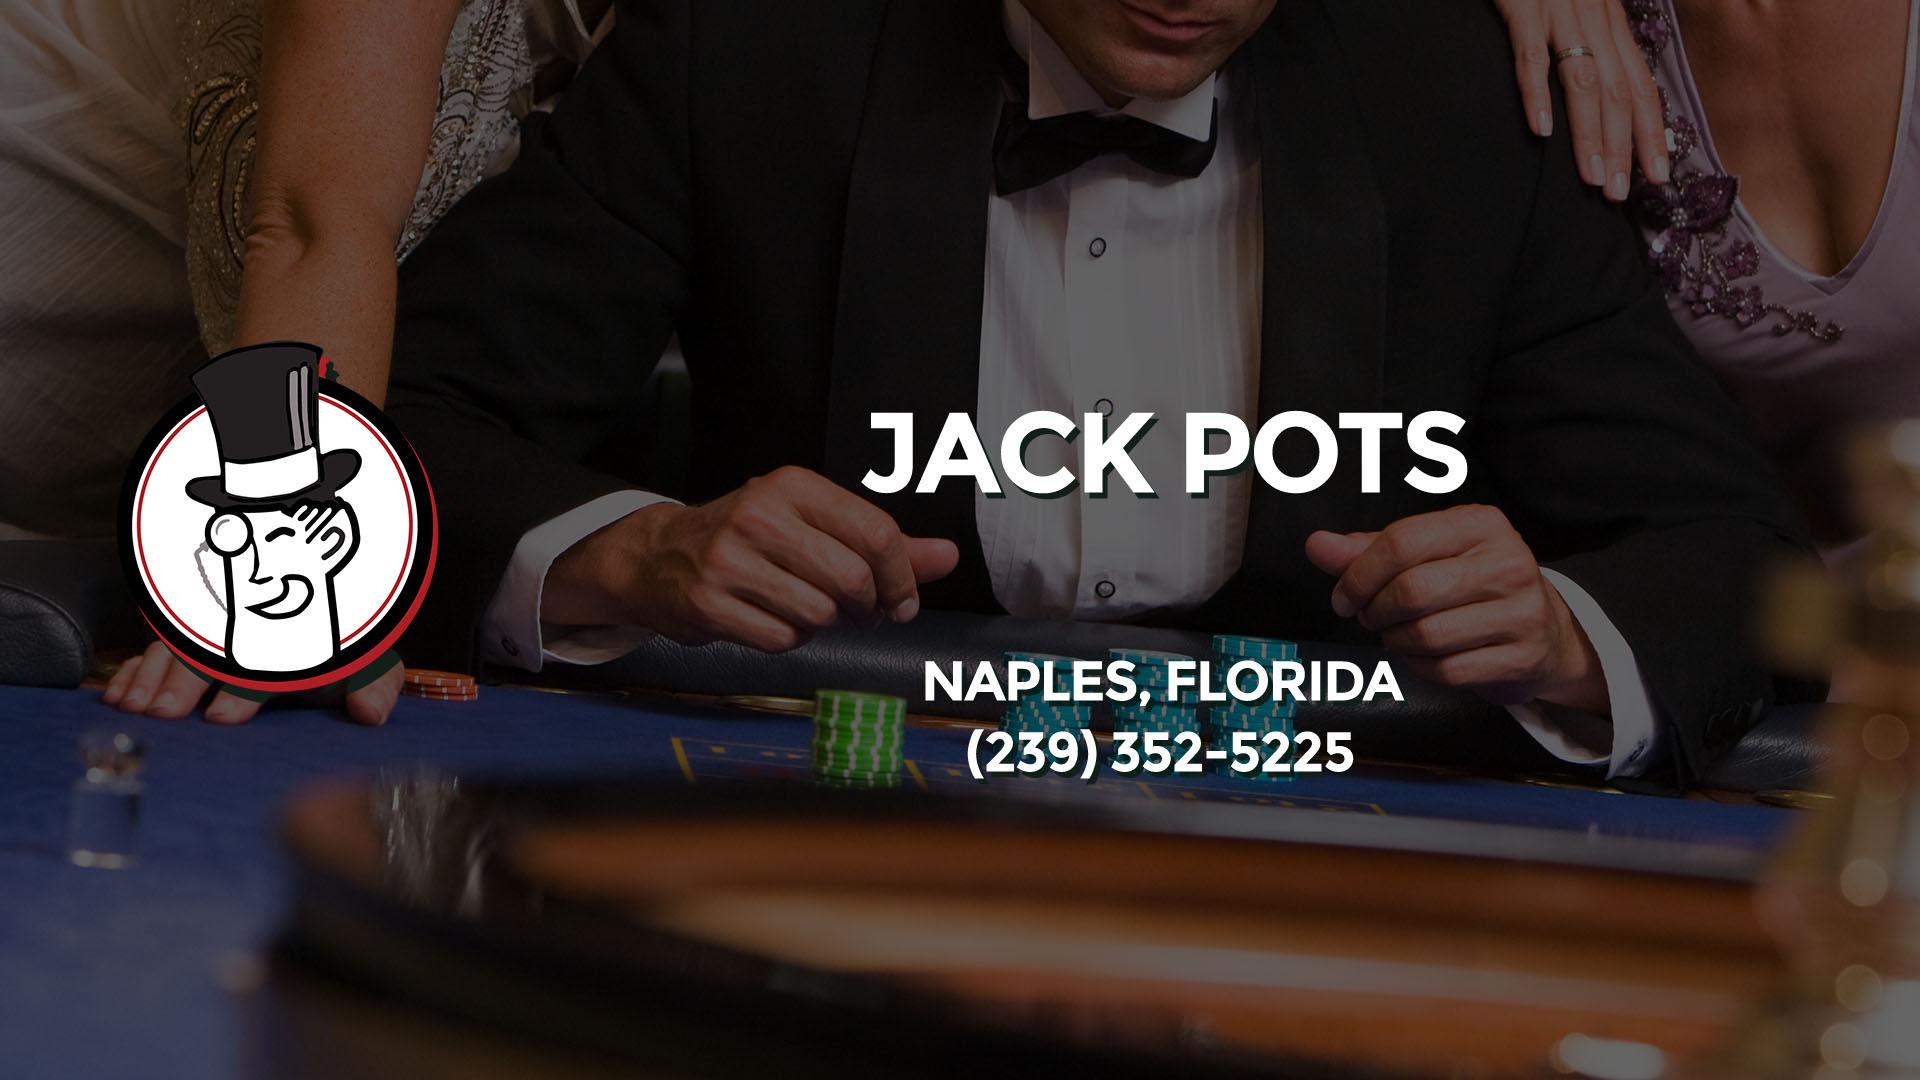 JACK POTS NAPLES FL